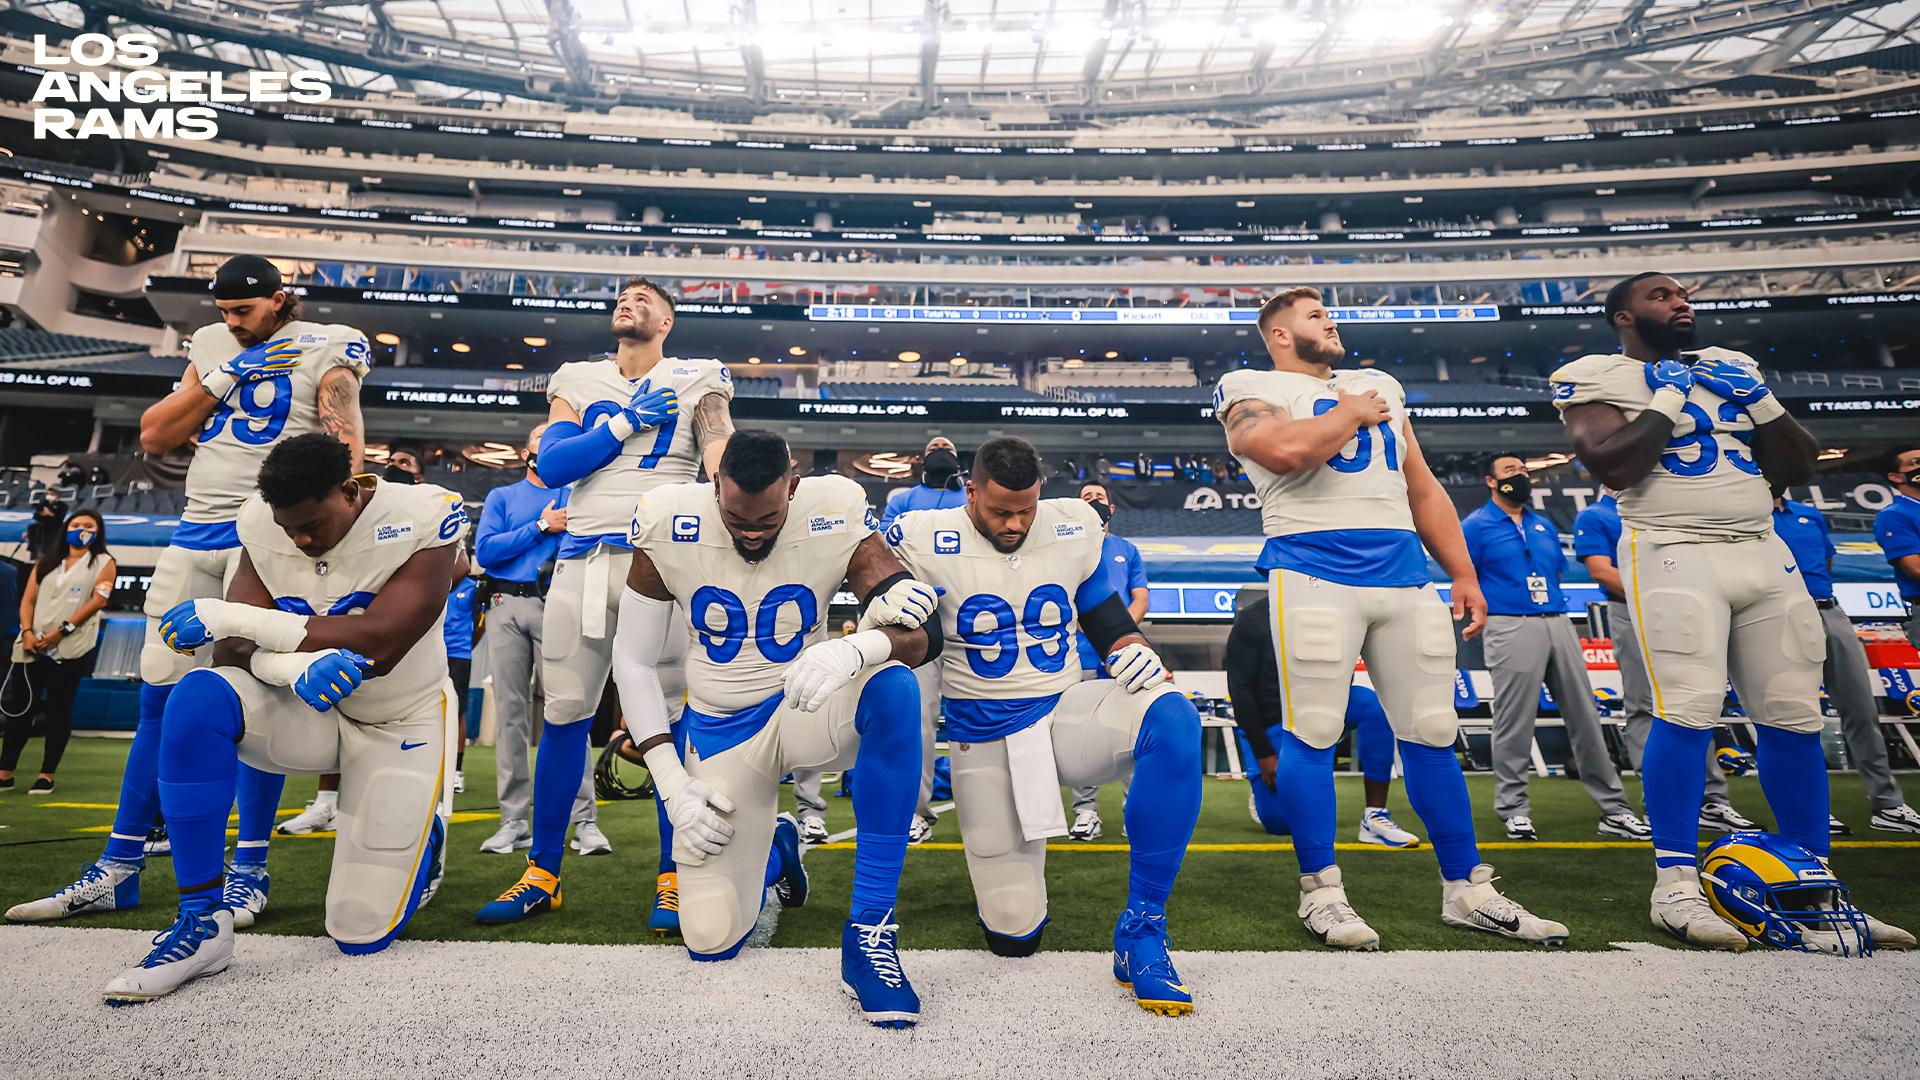 NBC's Sunday Night Football Ratings Crash Nearly 30% for Woke Opening Weekend